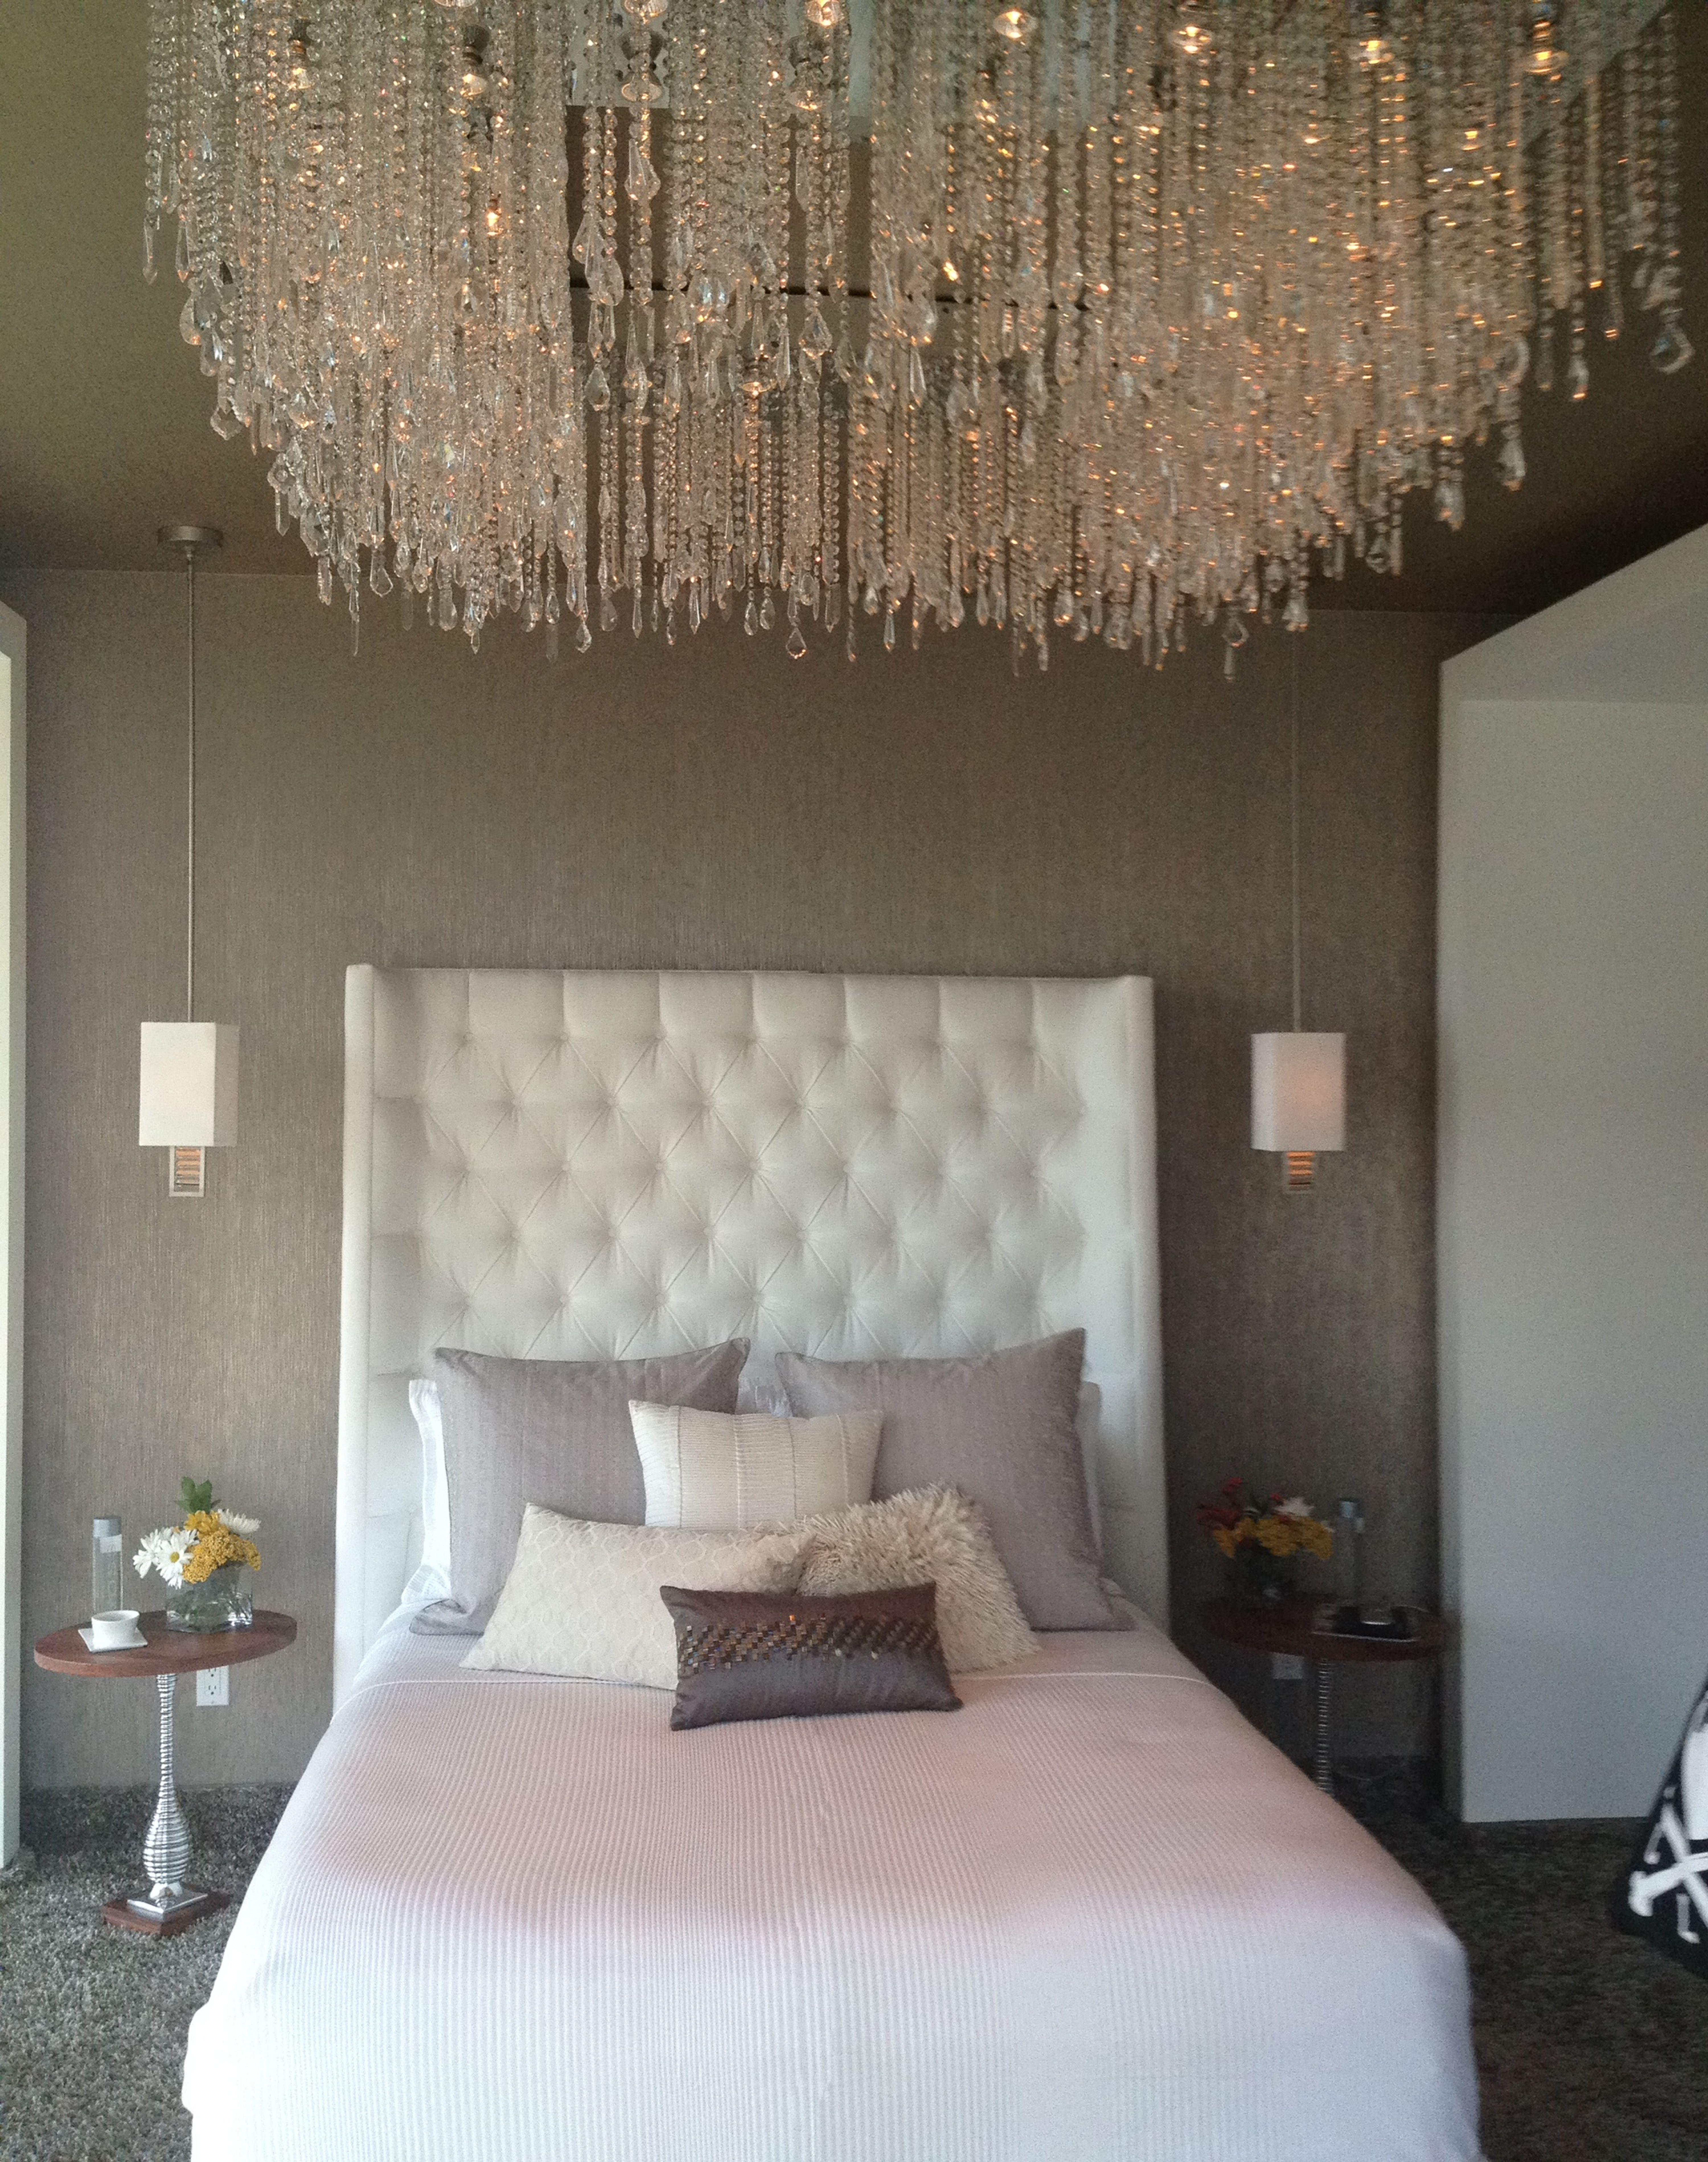 50++ Schoene lampen fuer schlafzimmer Trends